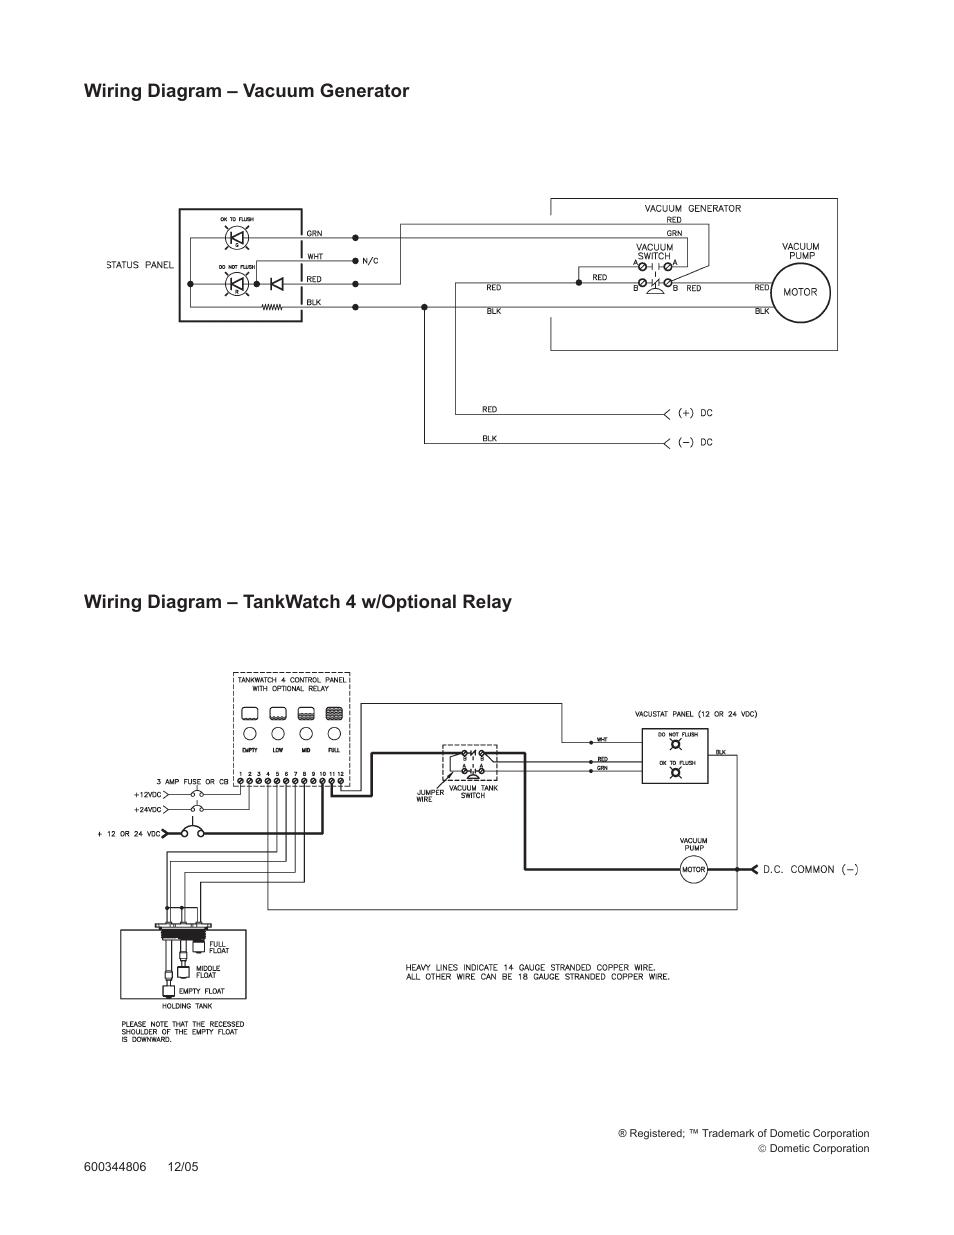 medium resolution of gewiss wiring instructions wiring diagram todaywiring diagram vacuum generator wiring diagram tankwatch 4 w gewiss